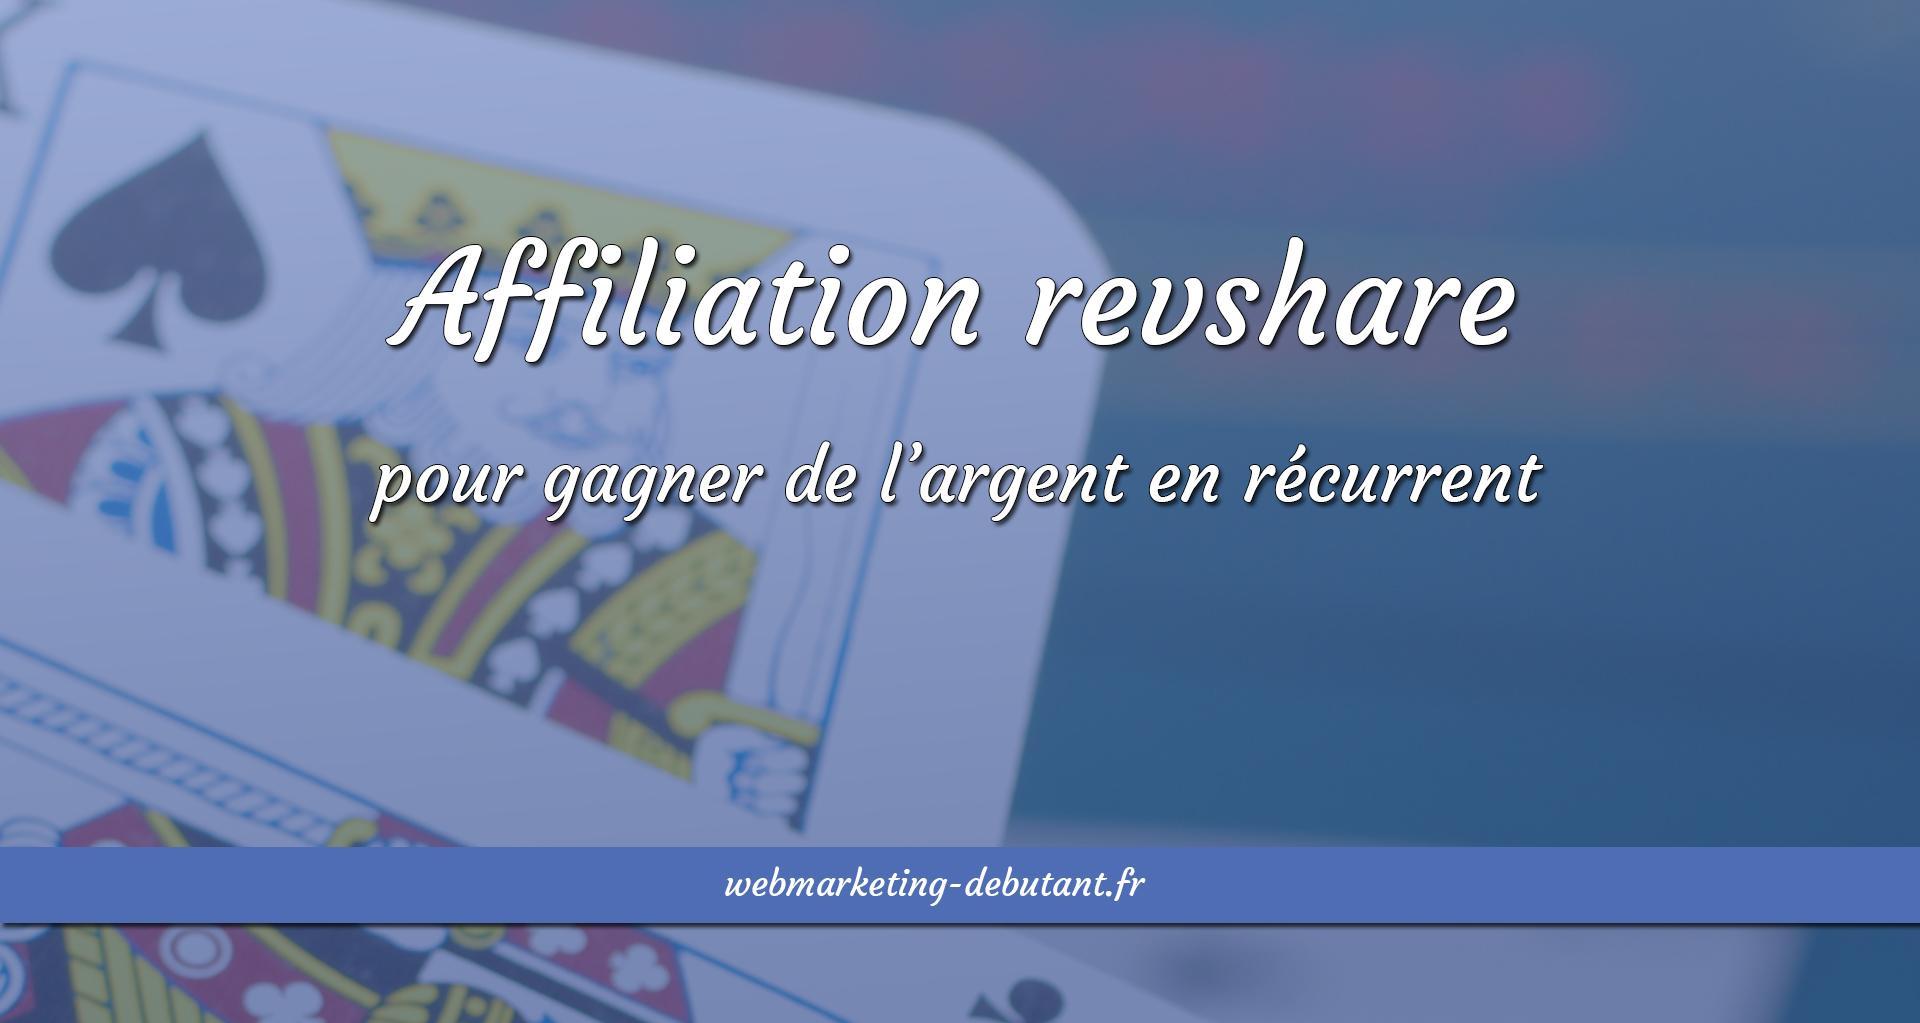 affiliation revshare